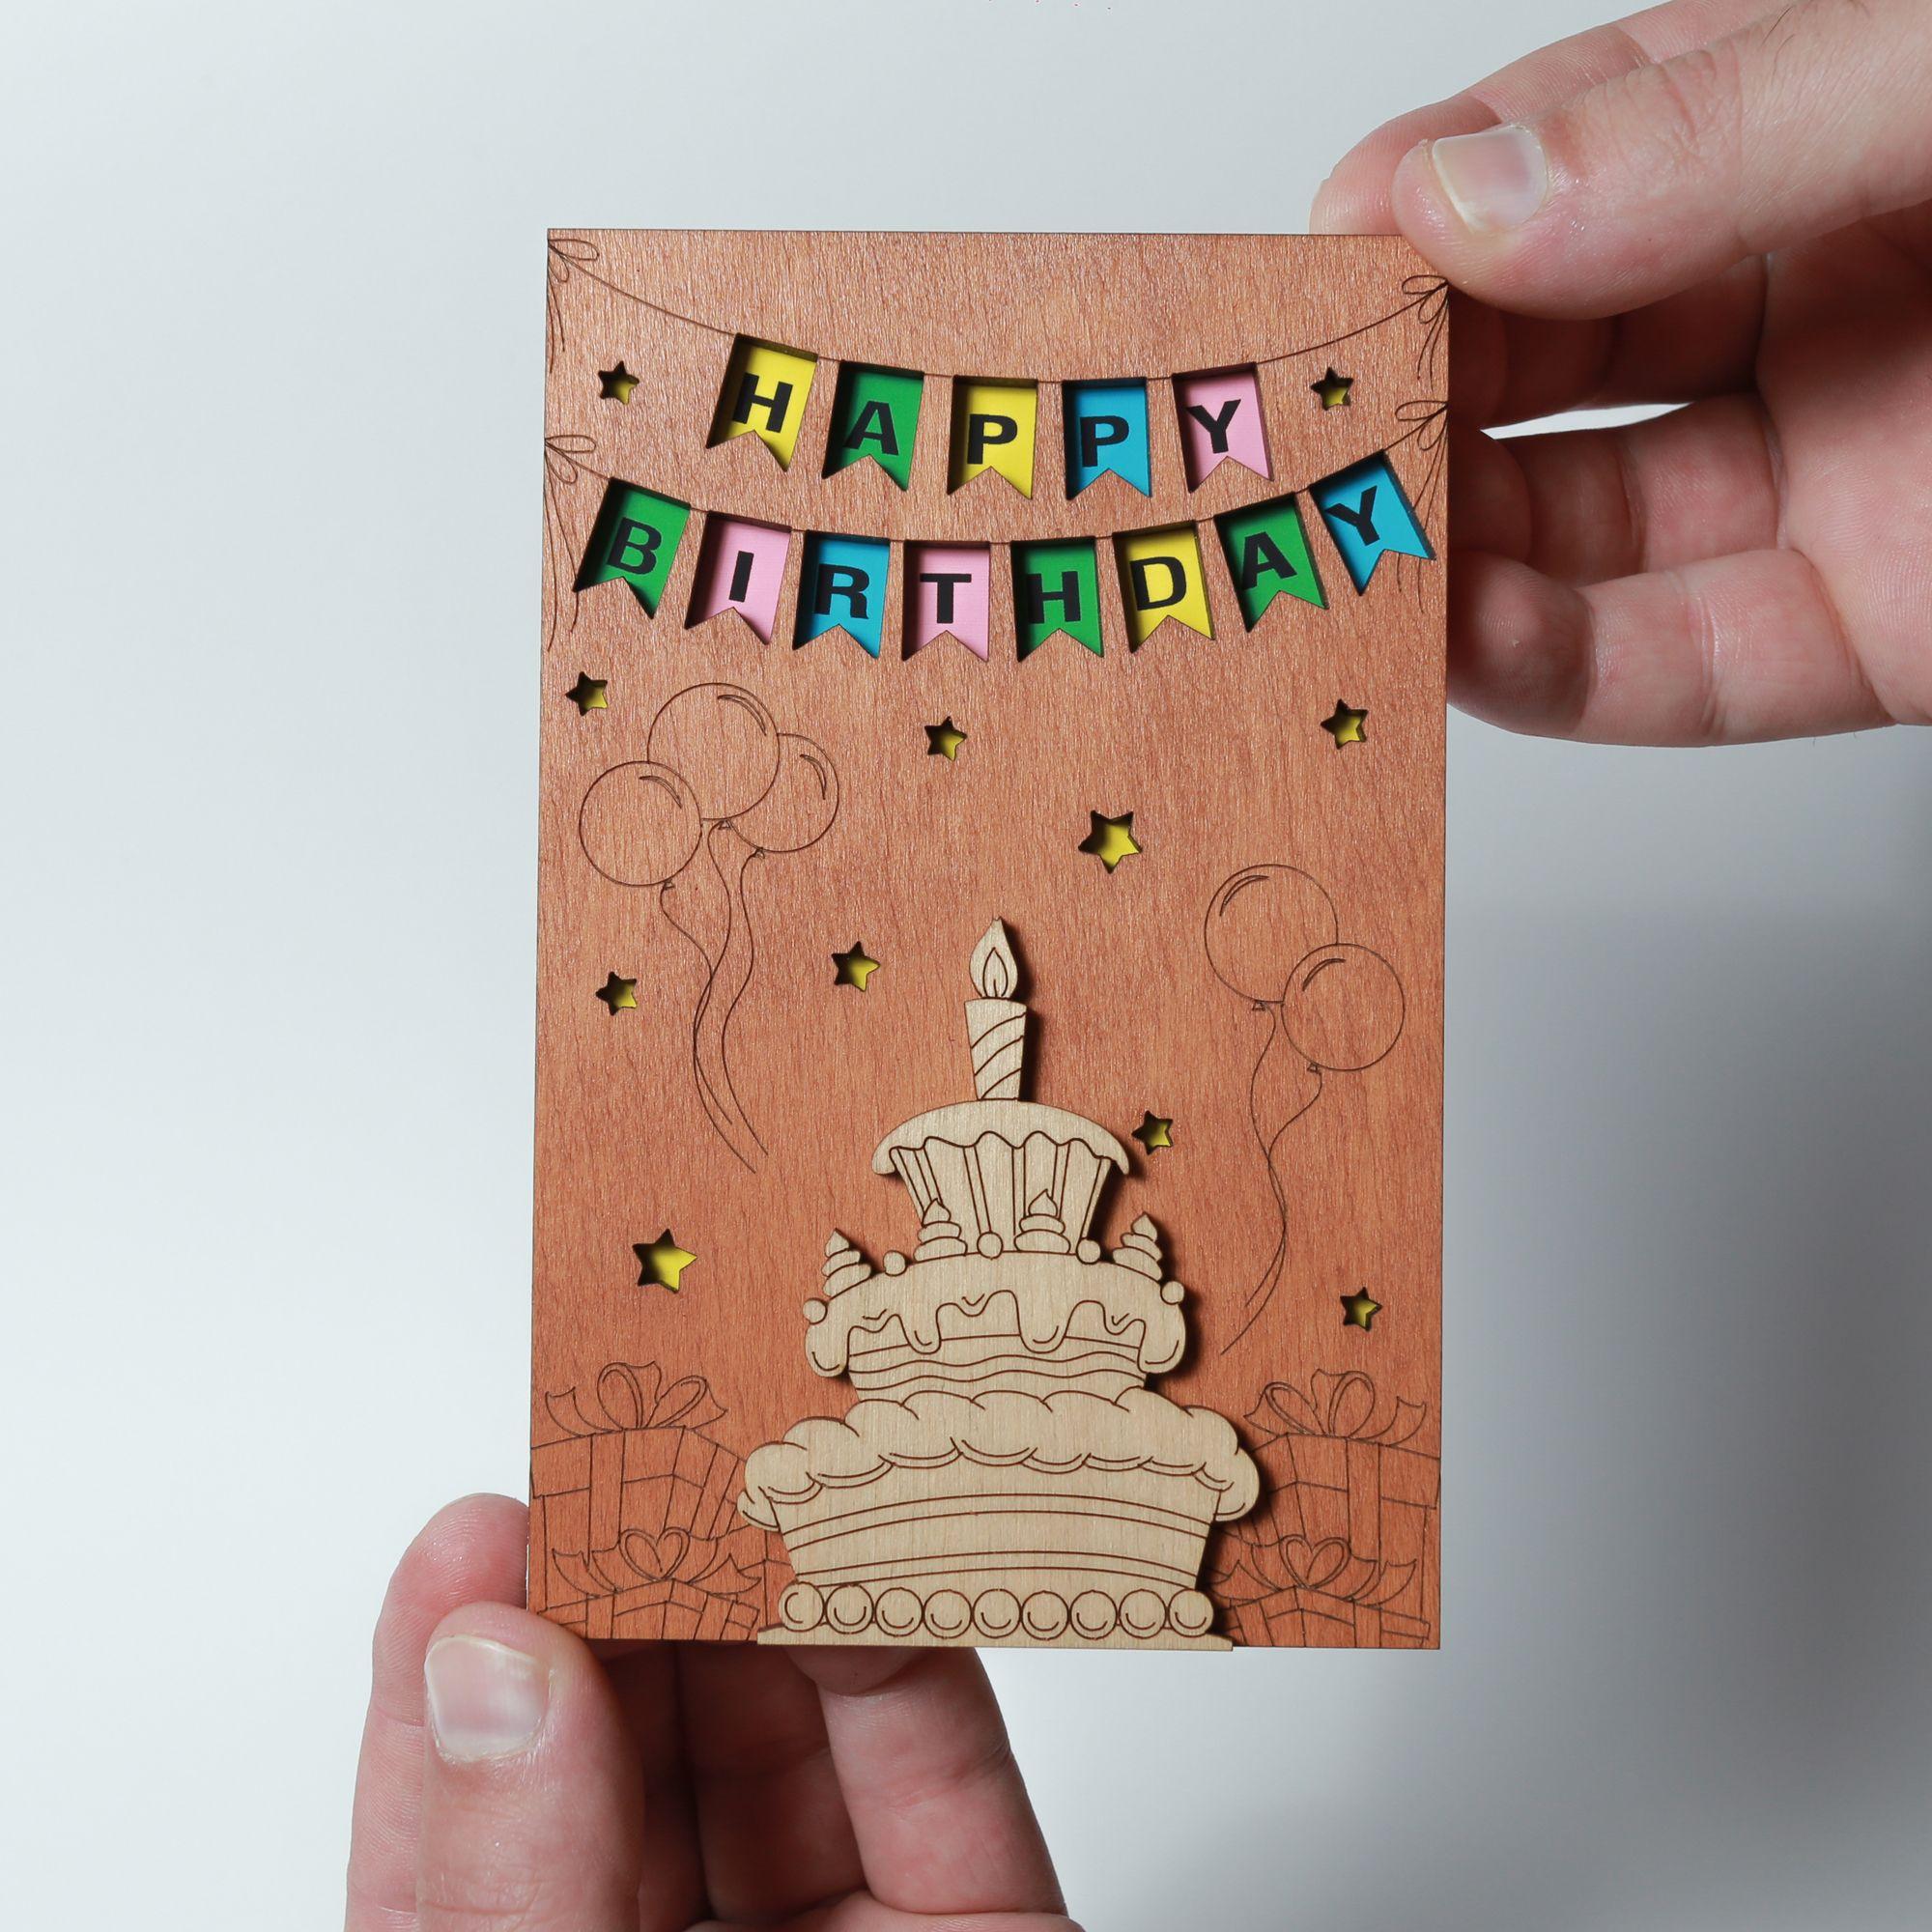 Happy Birthday Card Best Handmade Wooden Gift Cute Birthday Present For Him Boyfriend Husba Birthday Presents For Him Happy Birthday Cards Presents For Him